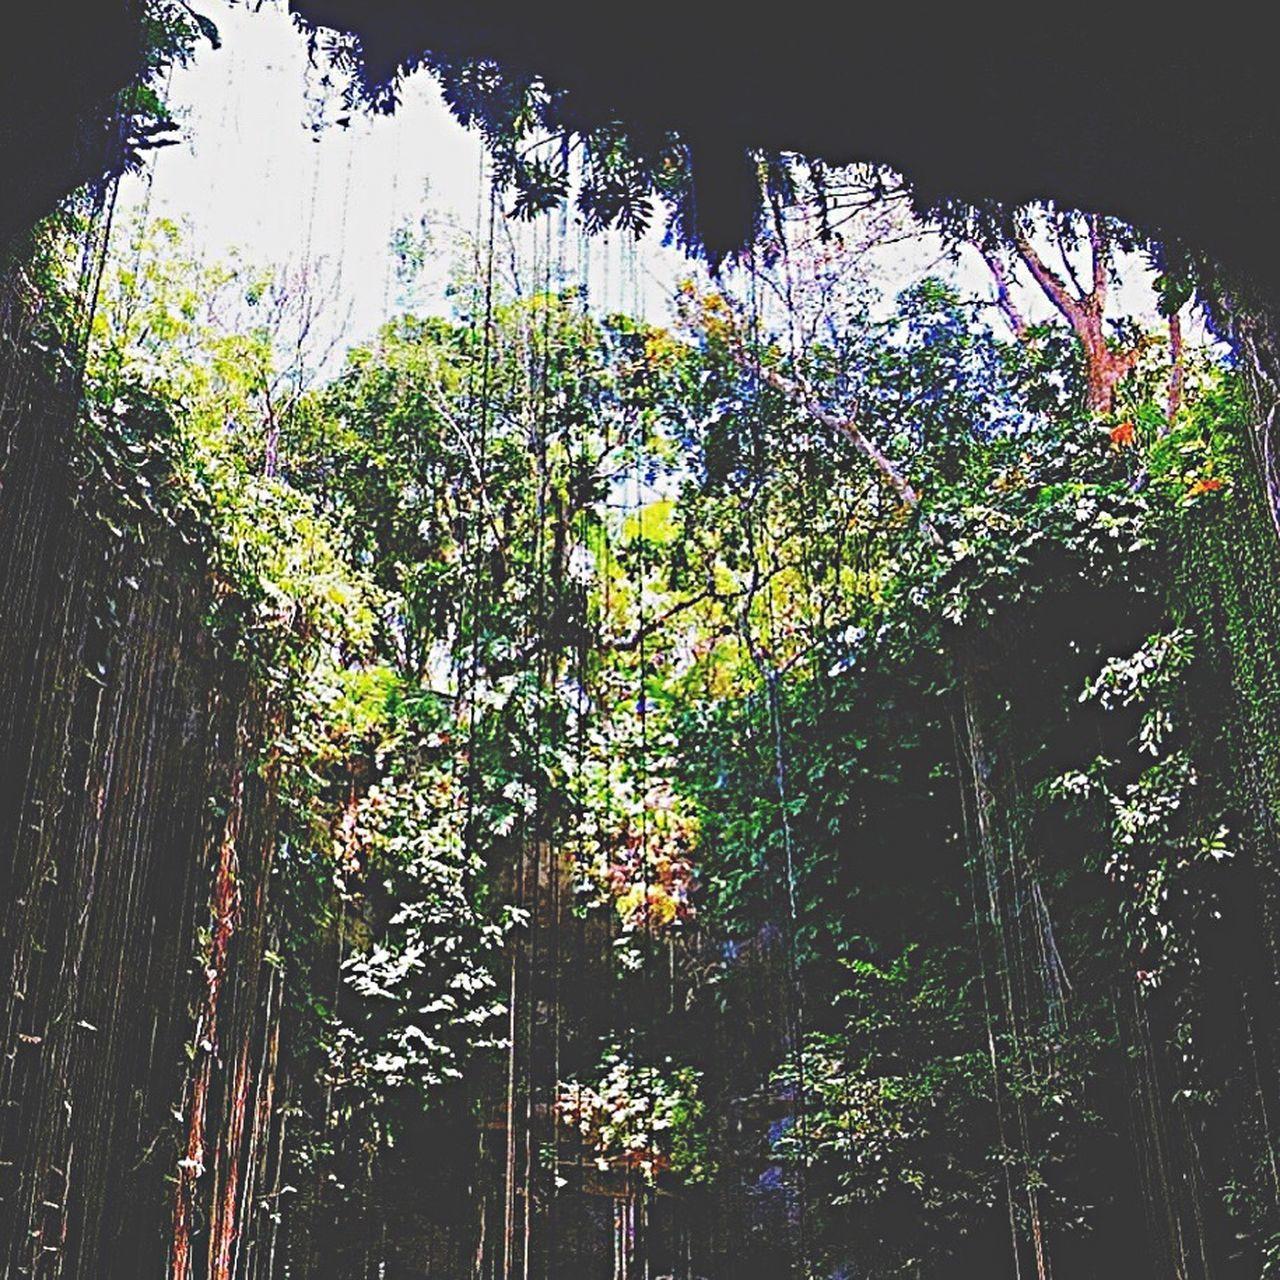 Vacation memory... Cenote Ik Kil Cenote Cenotes Ik Kil Mexico Yúcatan Yucatan Mexico Mayan Riviera Vaction Holiday Trip Chichenitza Chichen-Itzá Chichen Itza